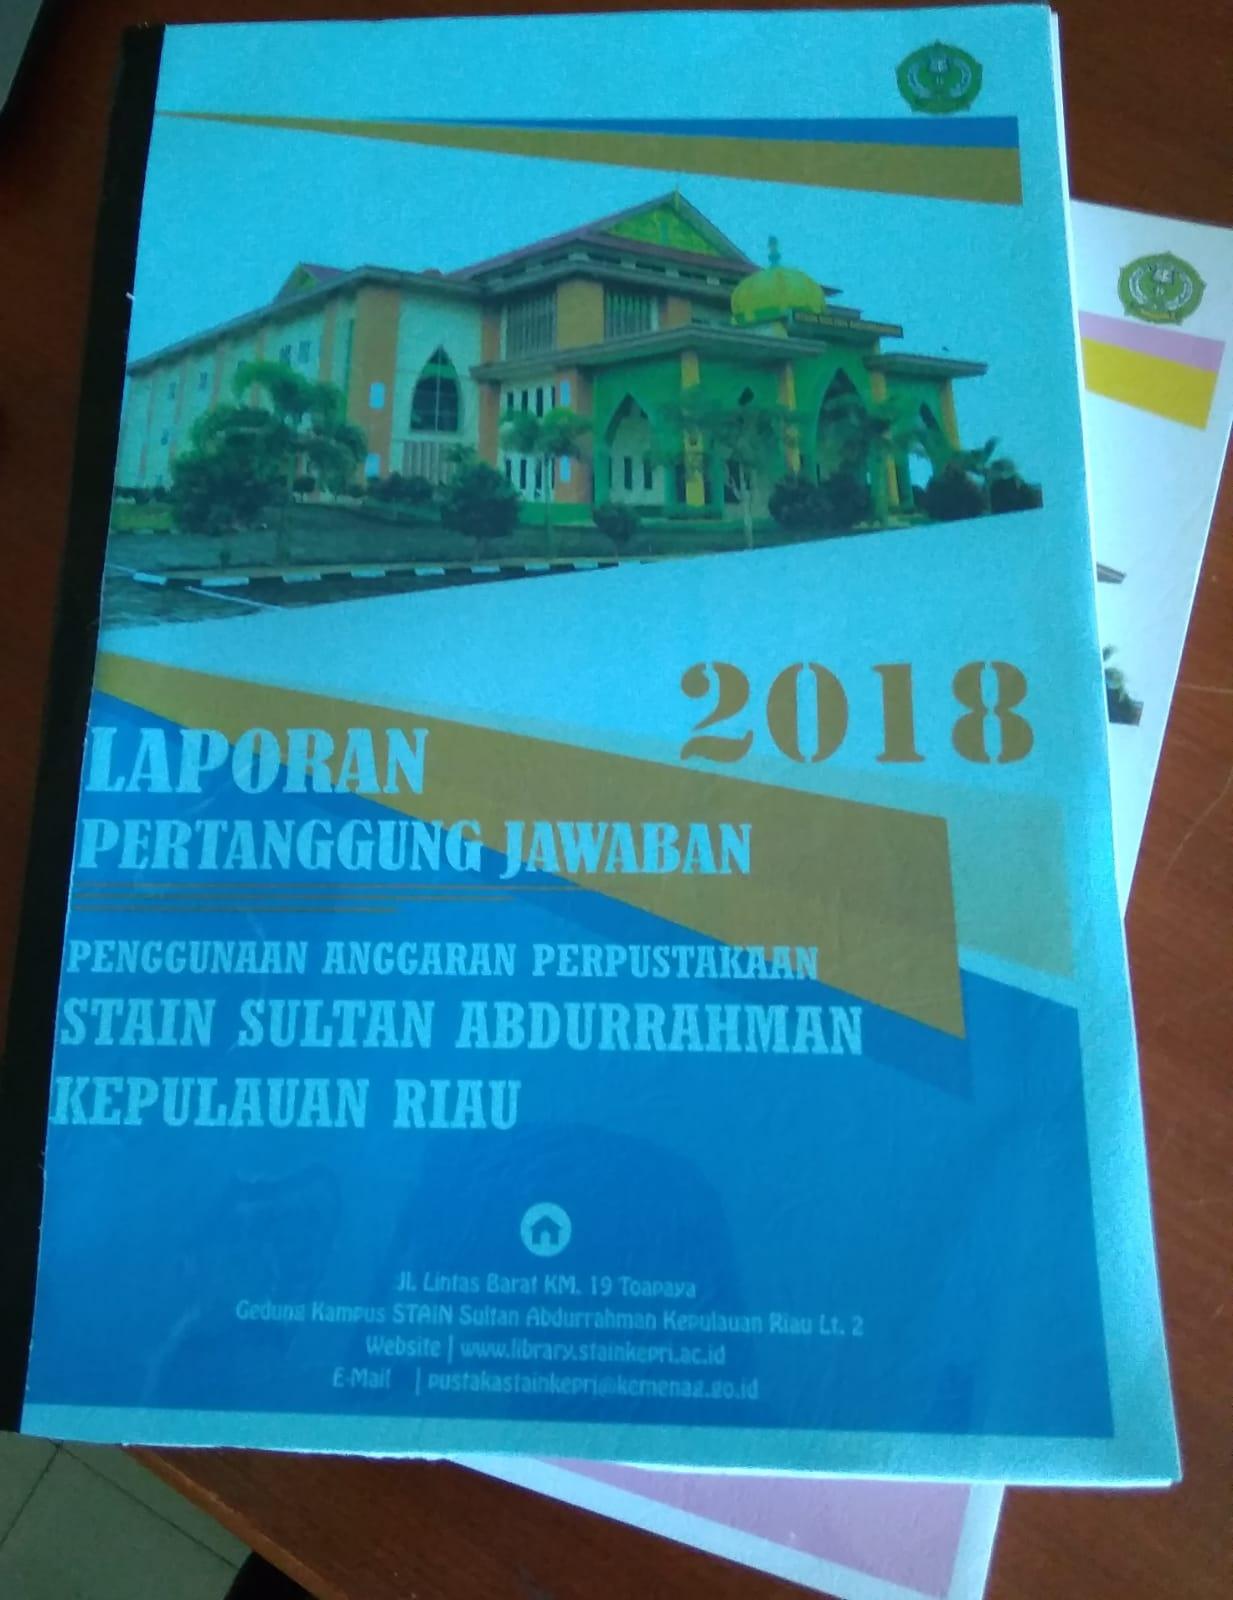 Laporan Pertanggung Jawaban Penggunaan Anggaran 2018